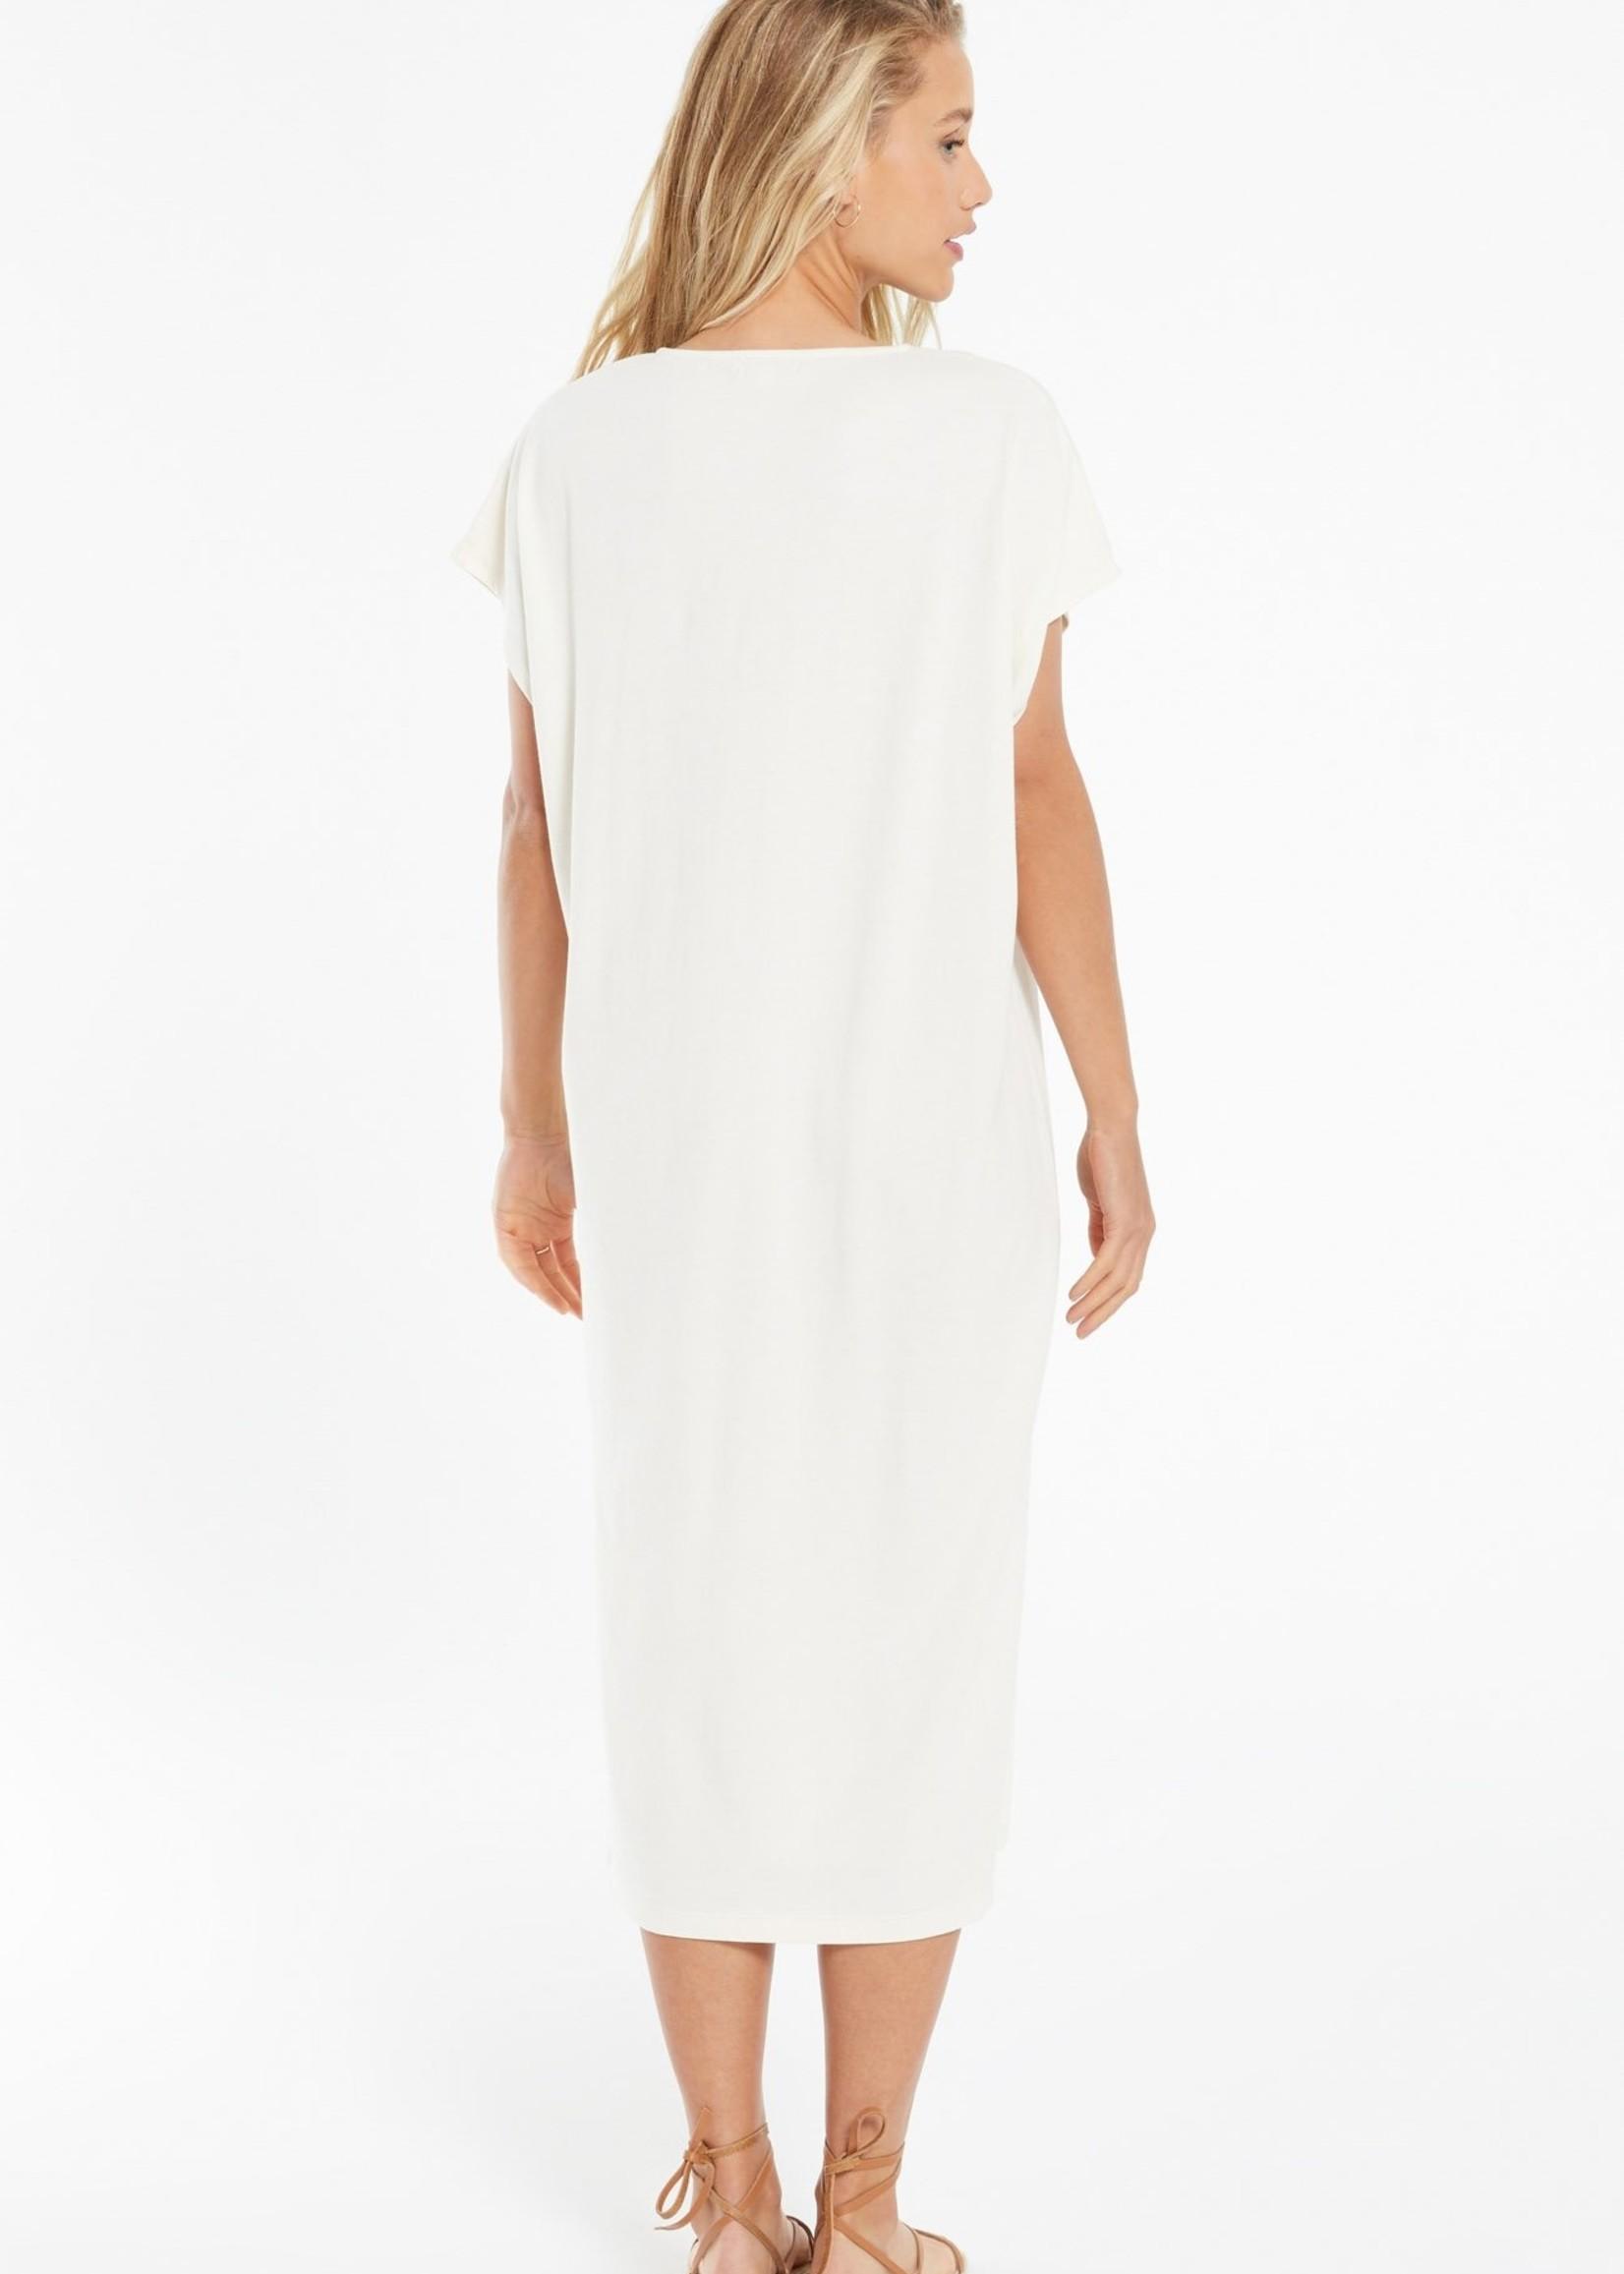 Z Supply Z Supply Sundial Dress